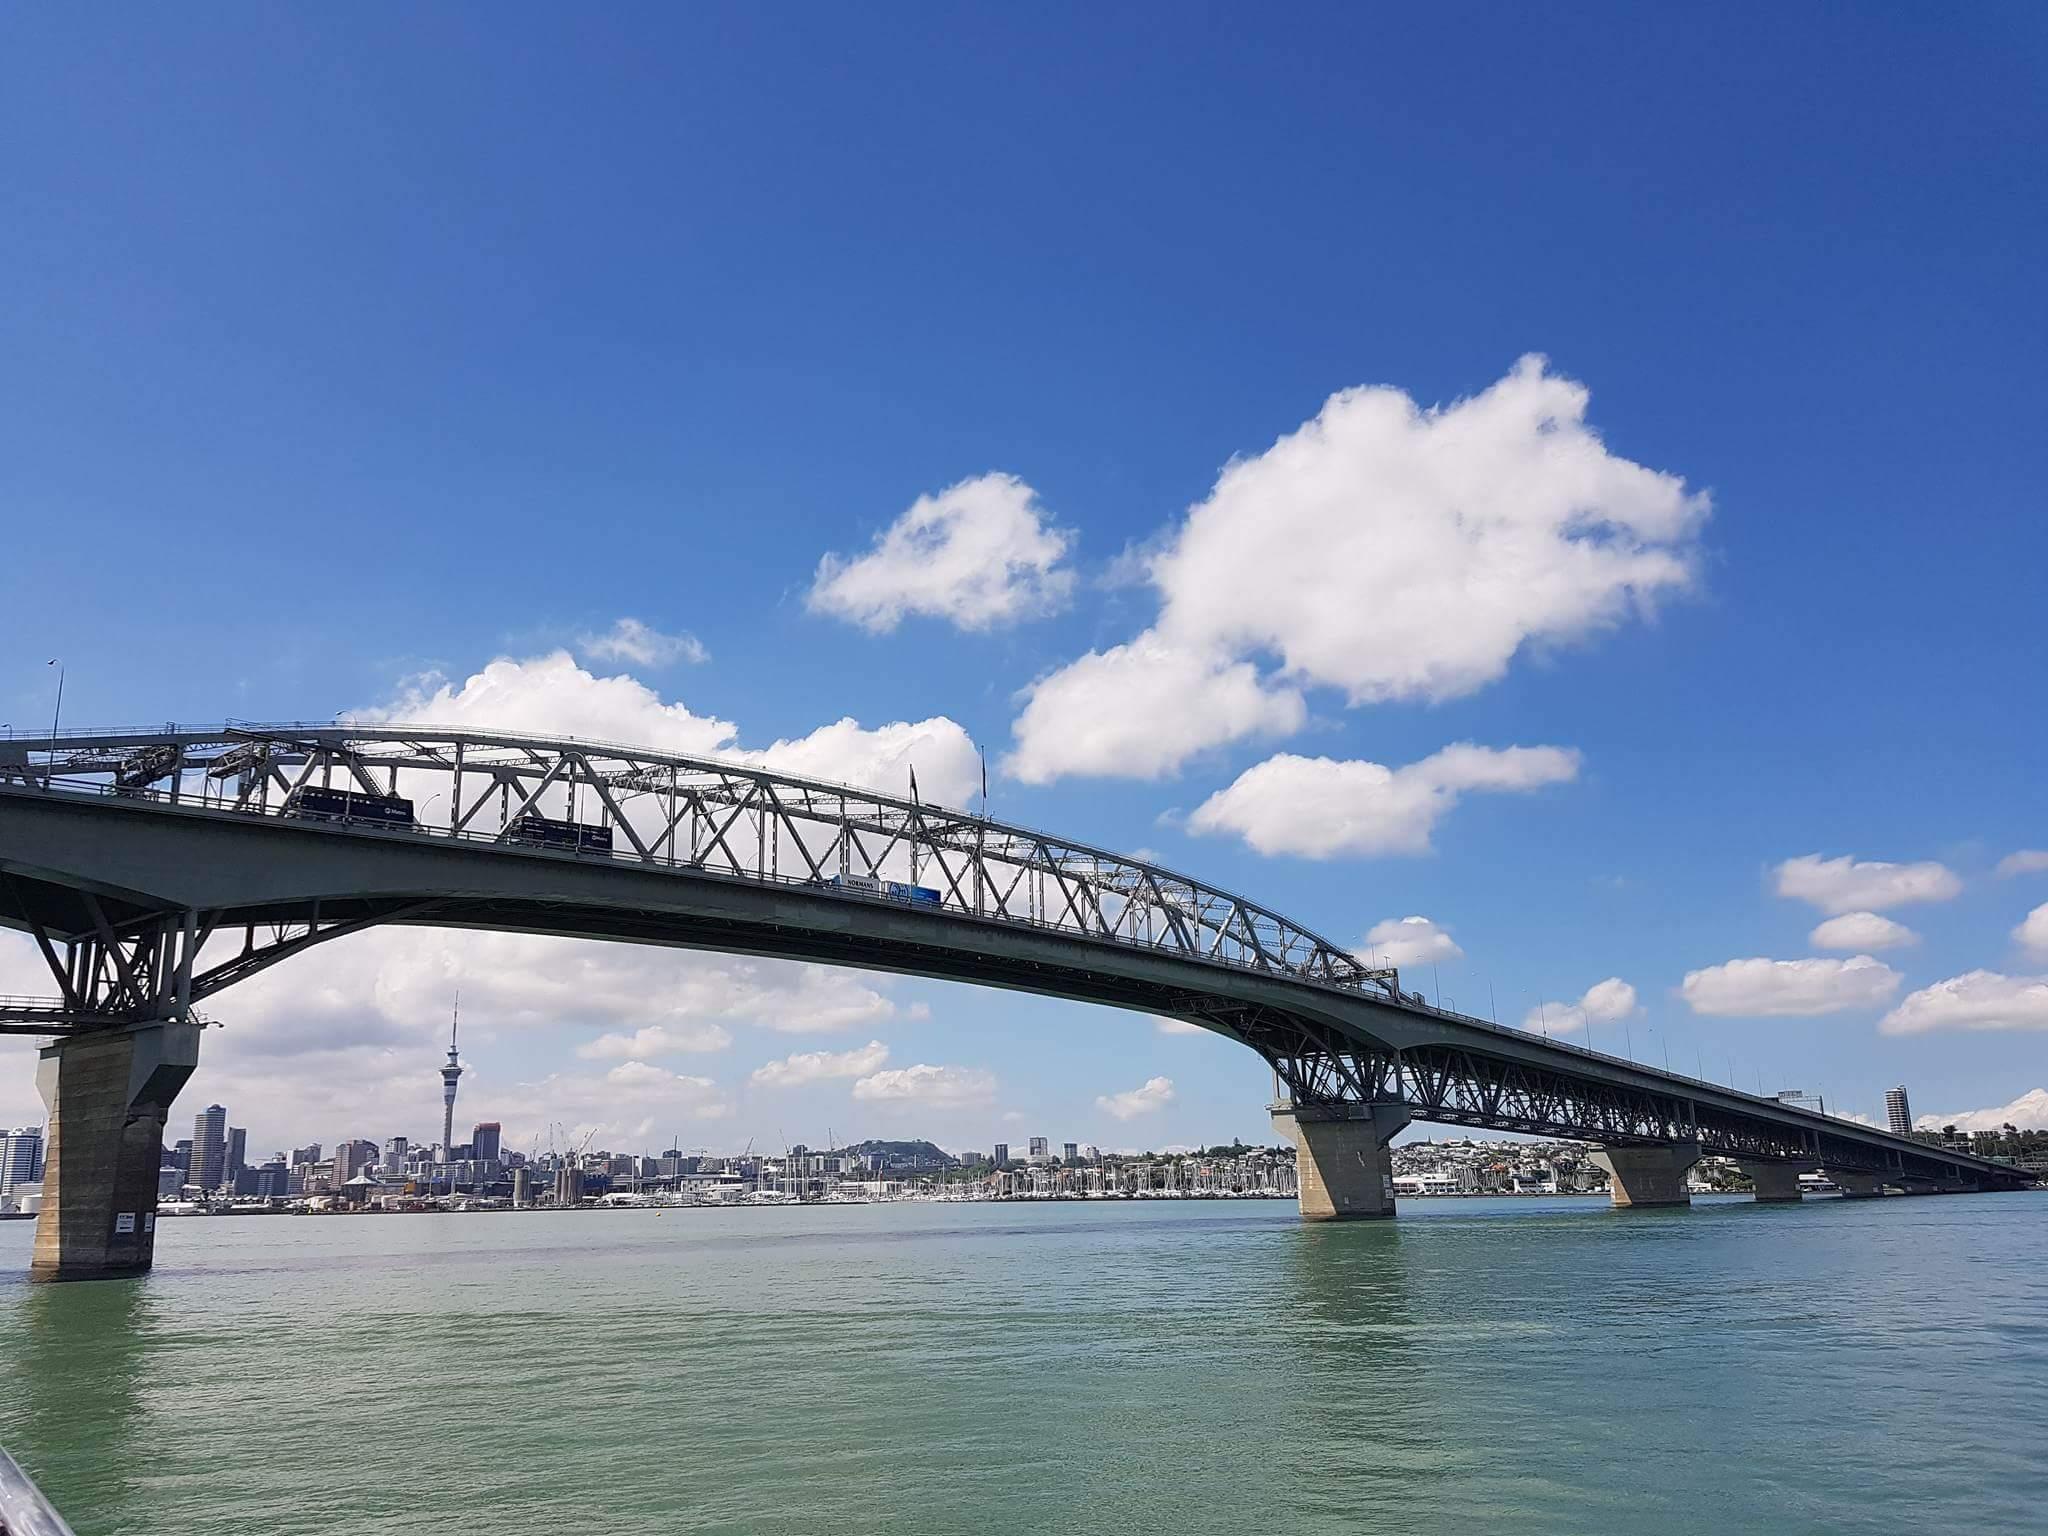 Auckland Harbor bridge and Sky tower in horizon, New Zealand